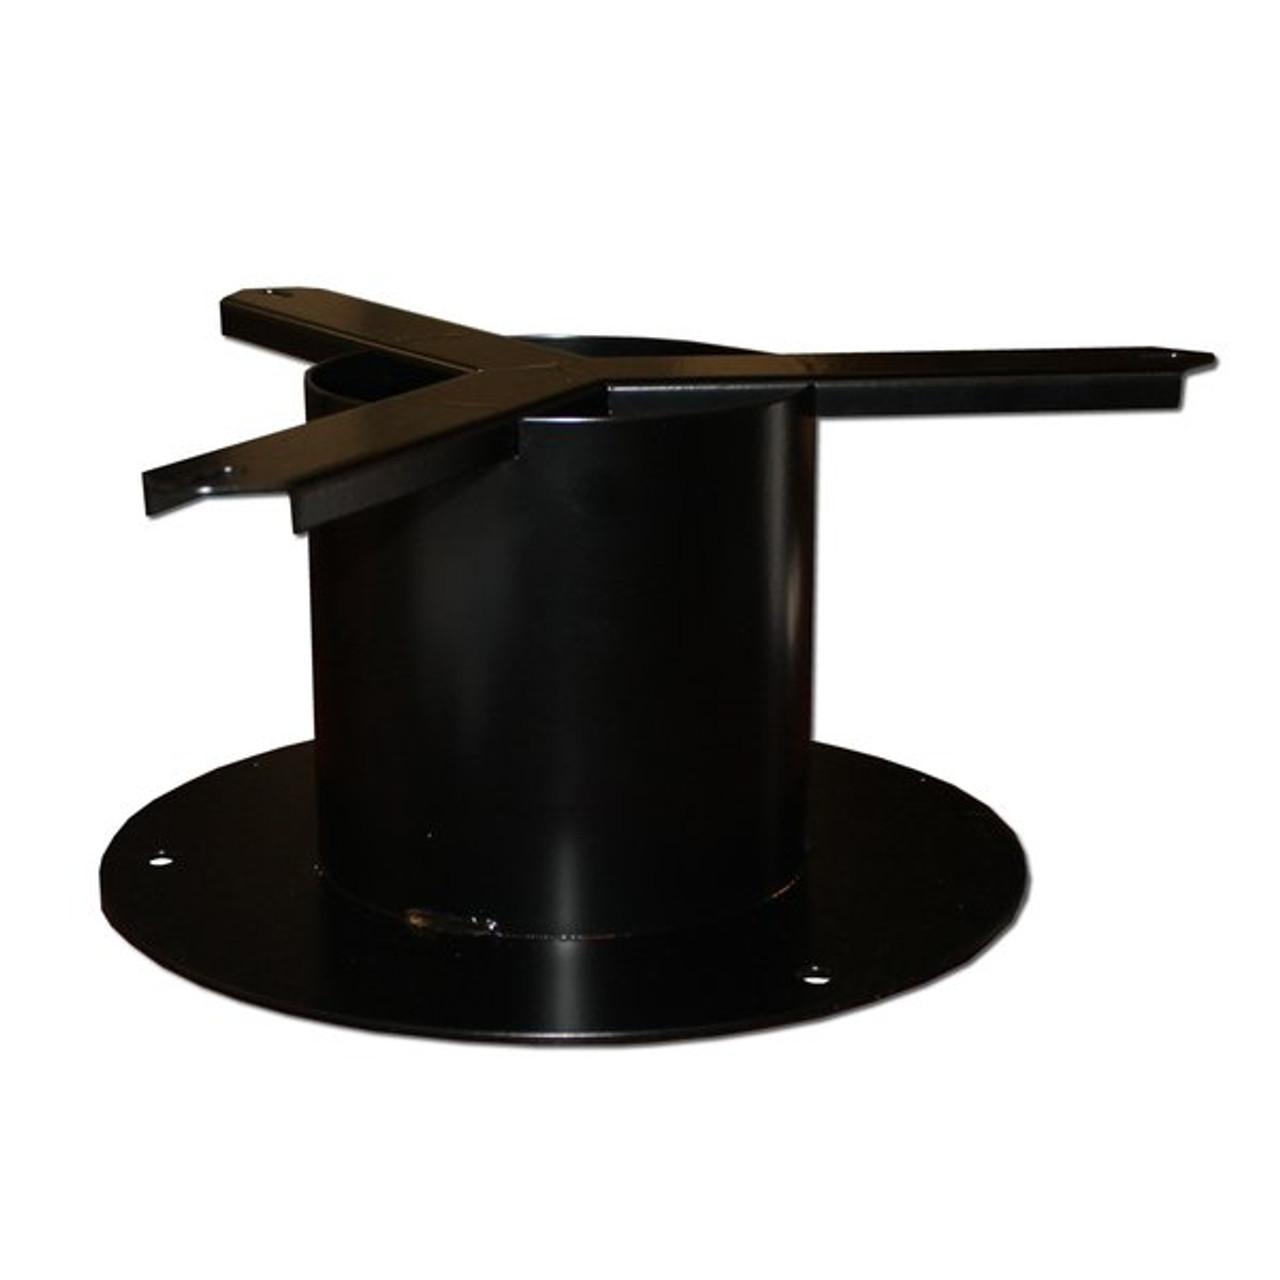 Black Steel Pedestal Mount P9001-00 for Kolorcans Plastic Trash Receptacles